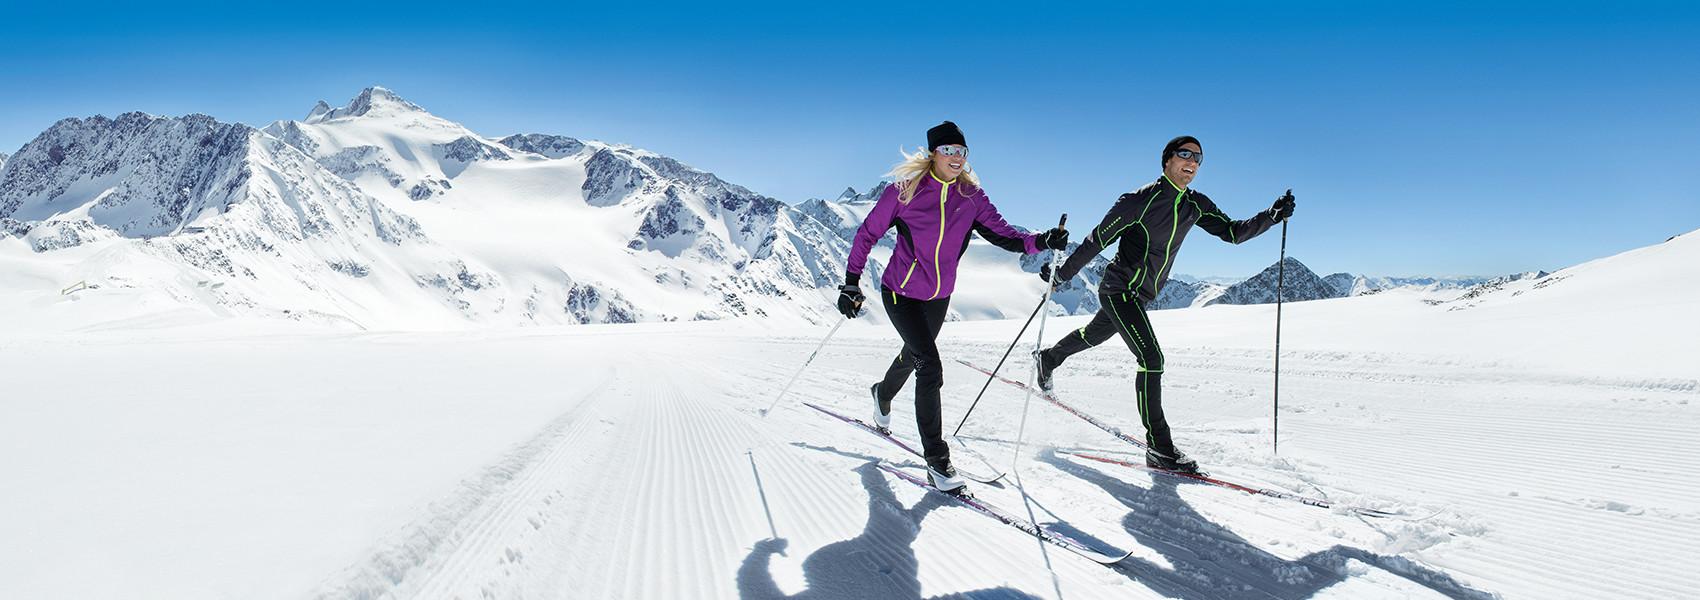 Ski Fashion Trends